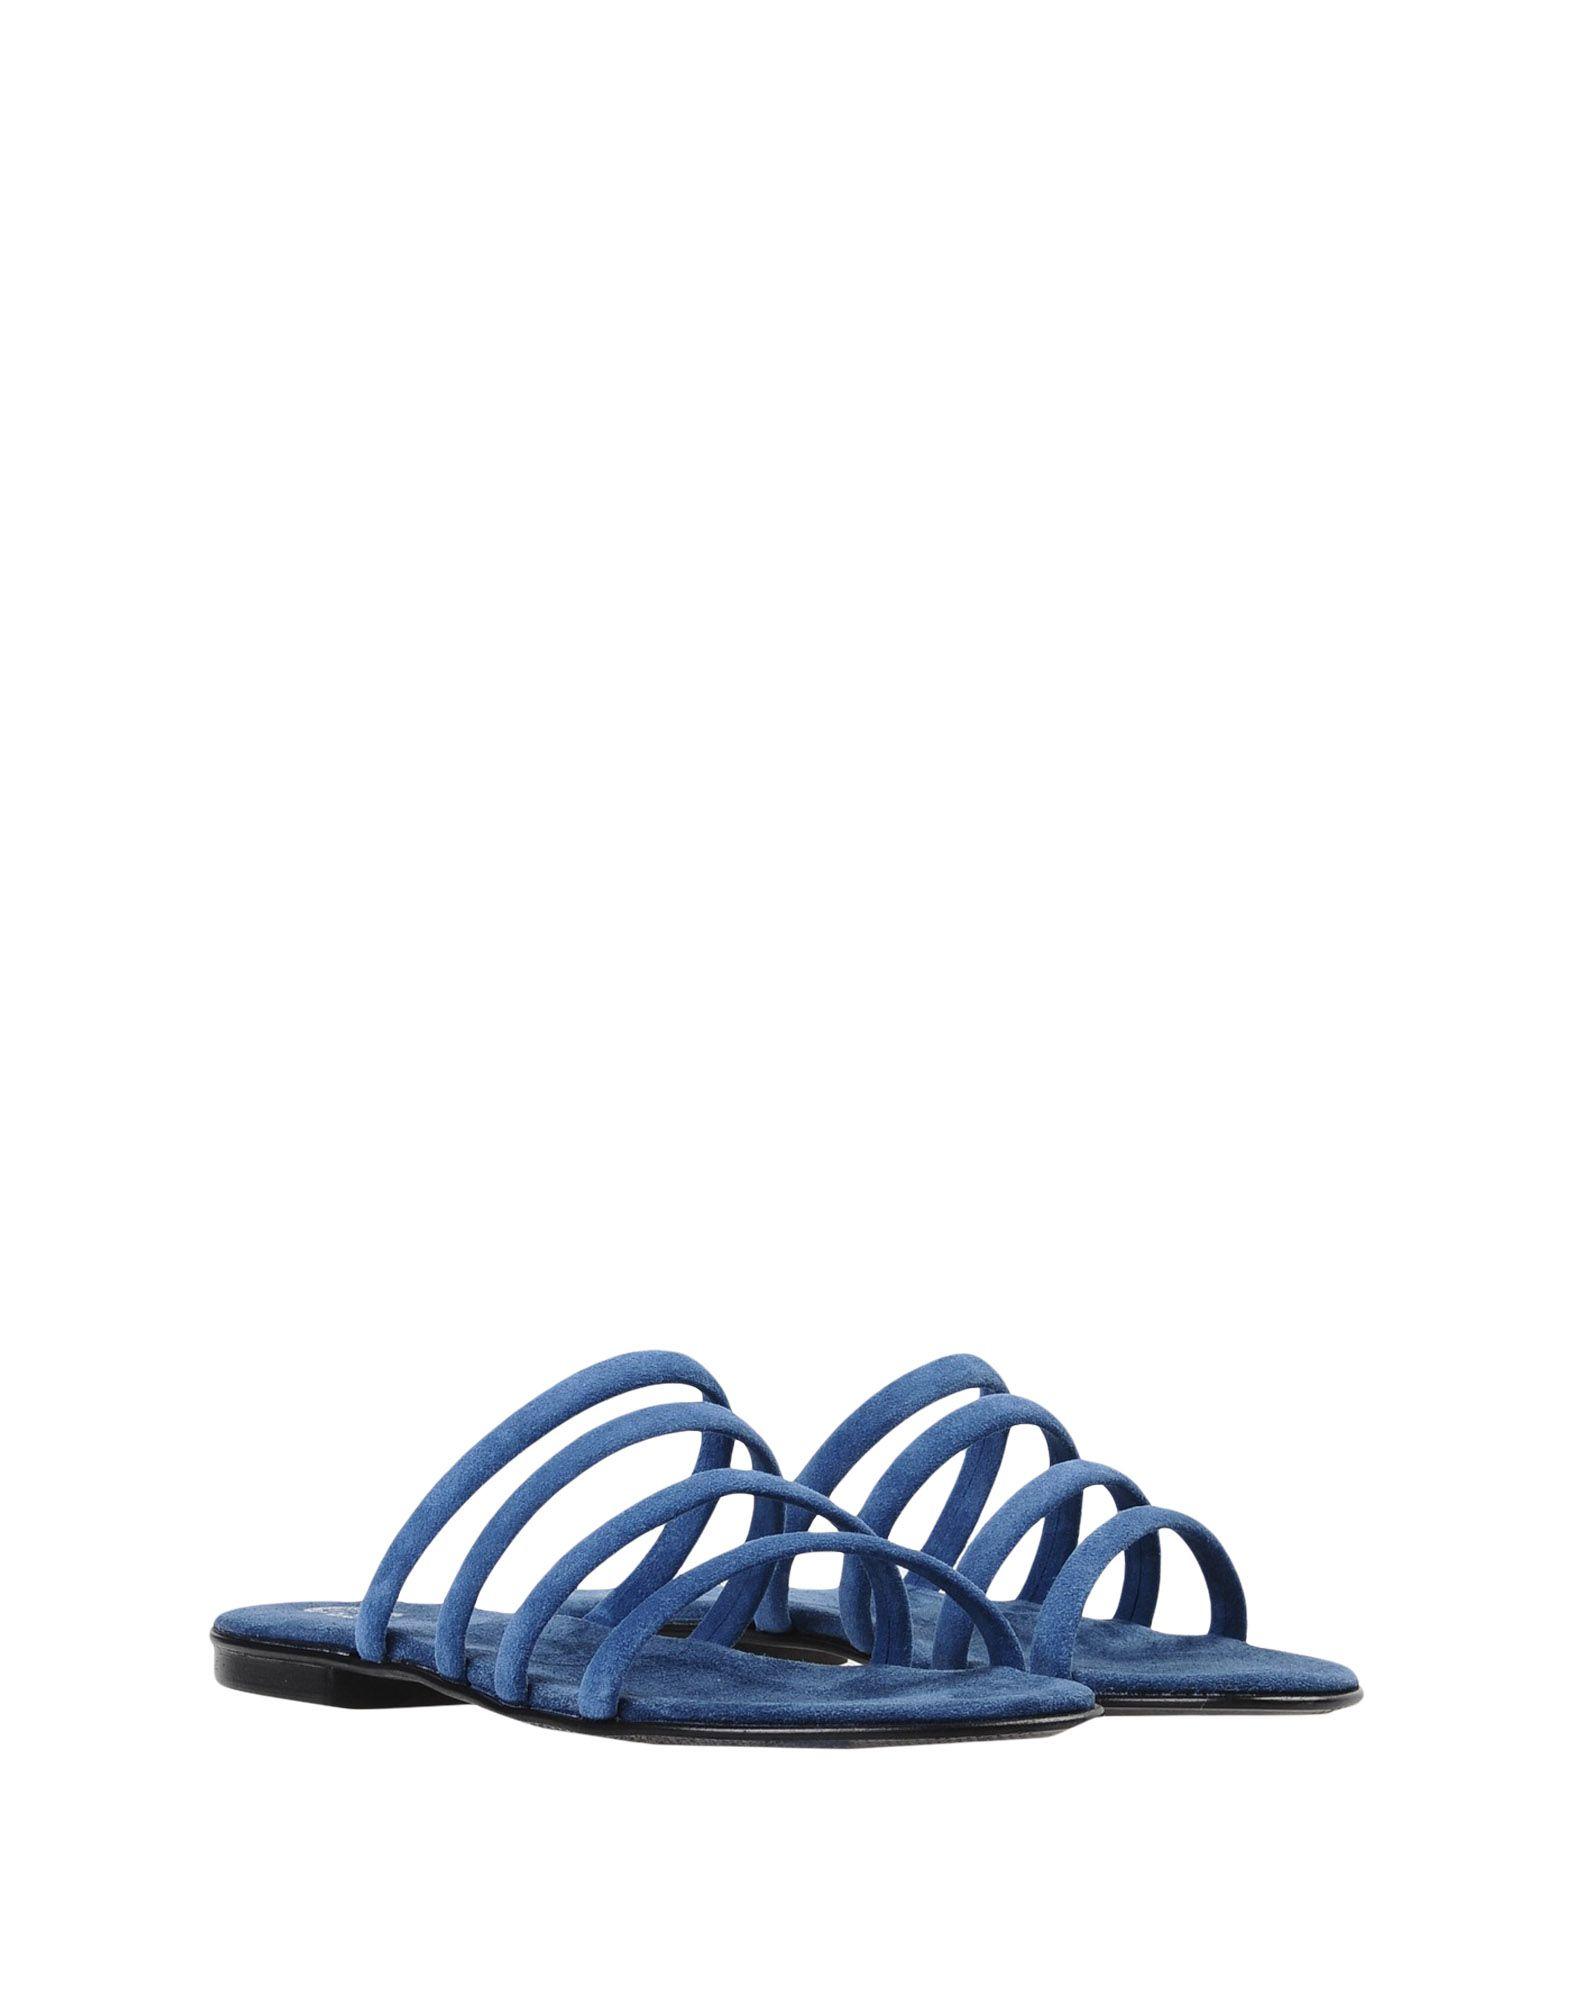 Sandales 8 Femme - Sandales 8 sur